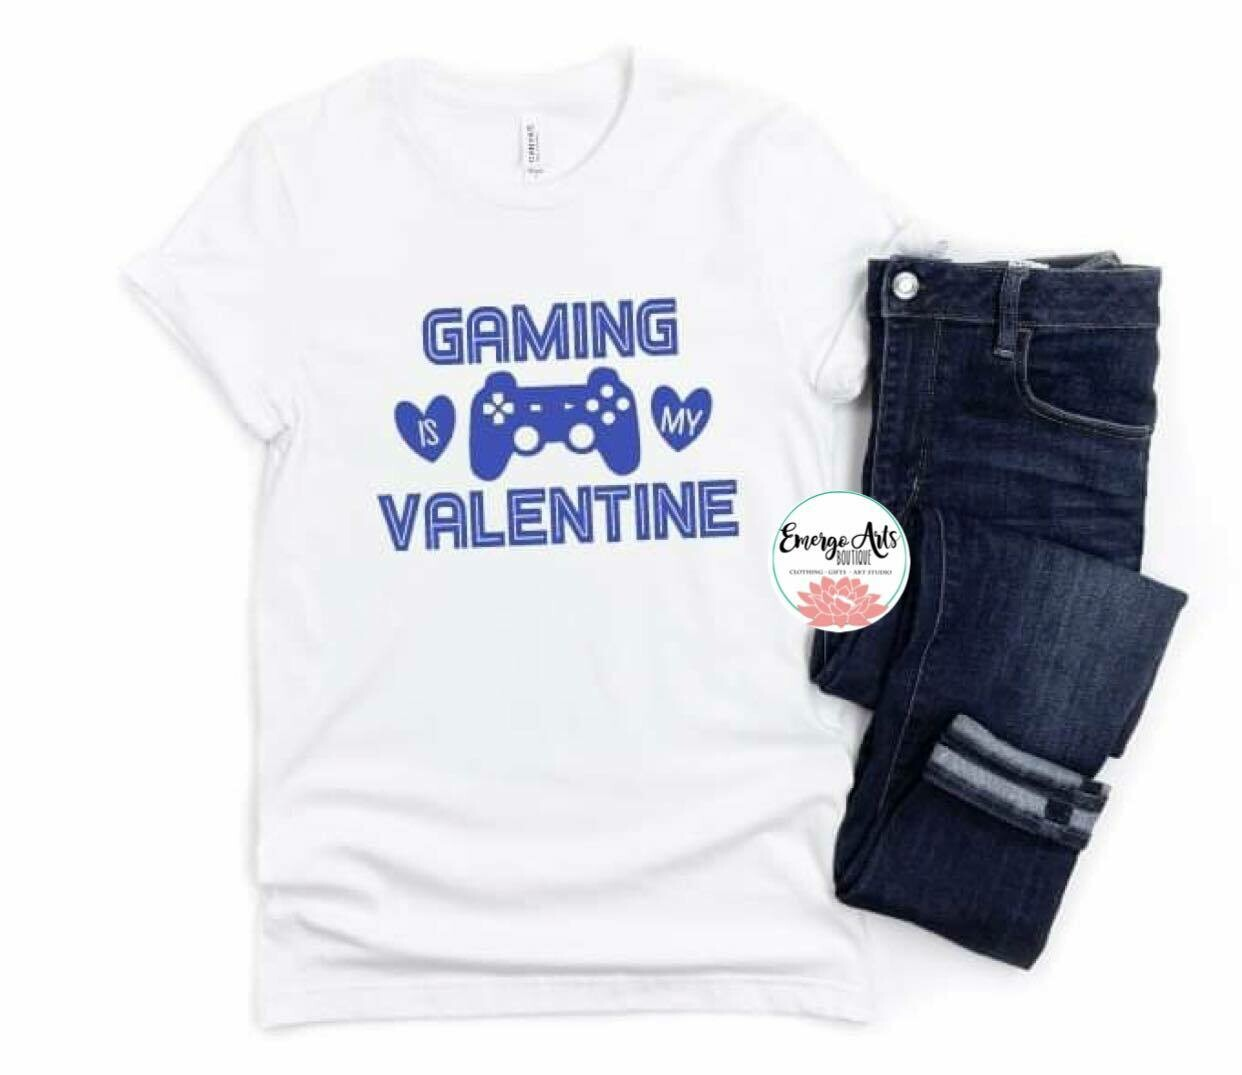 Gaming is my Valentine Shirt